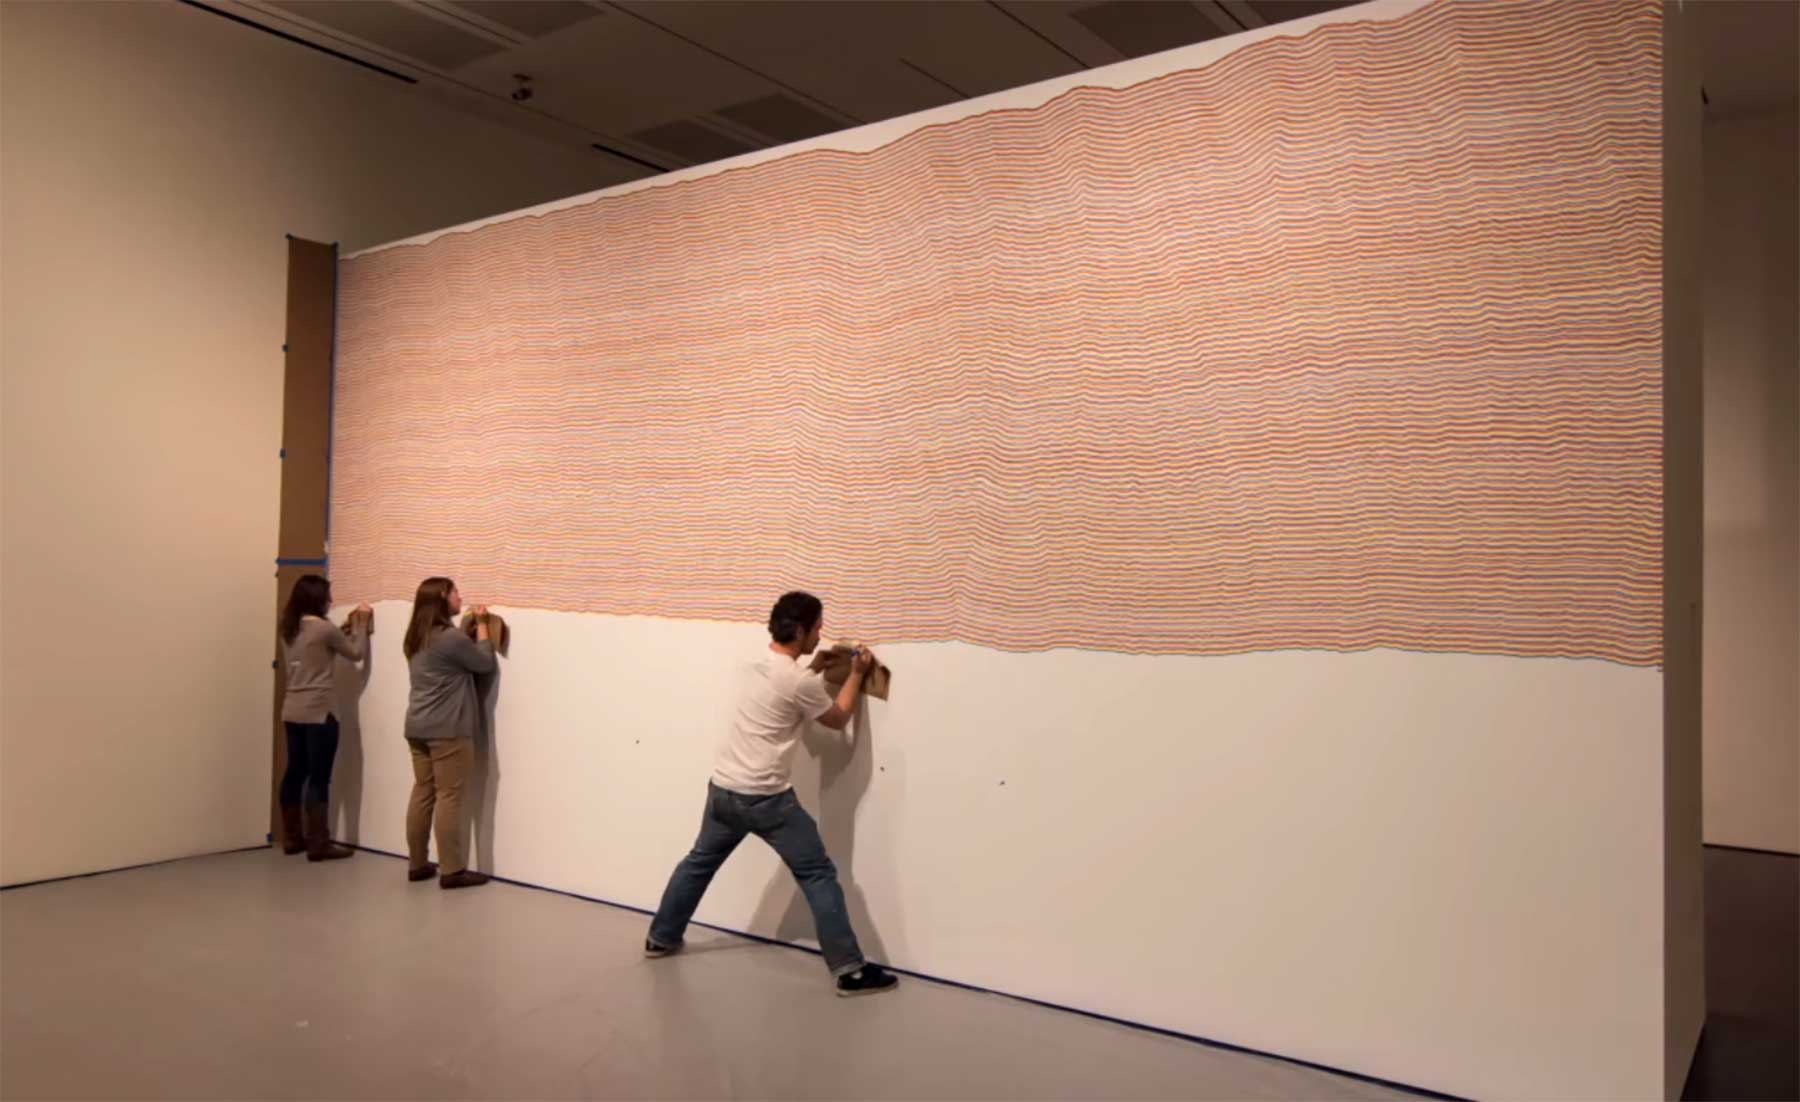 Timelapse: Eine Wand voller Linien bemalen timelapse-Sol-LeWitt-Wall-Drawing-797